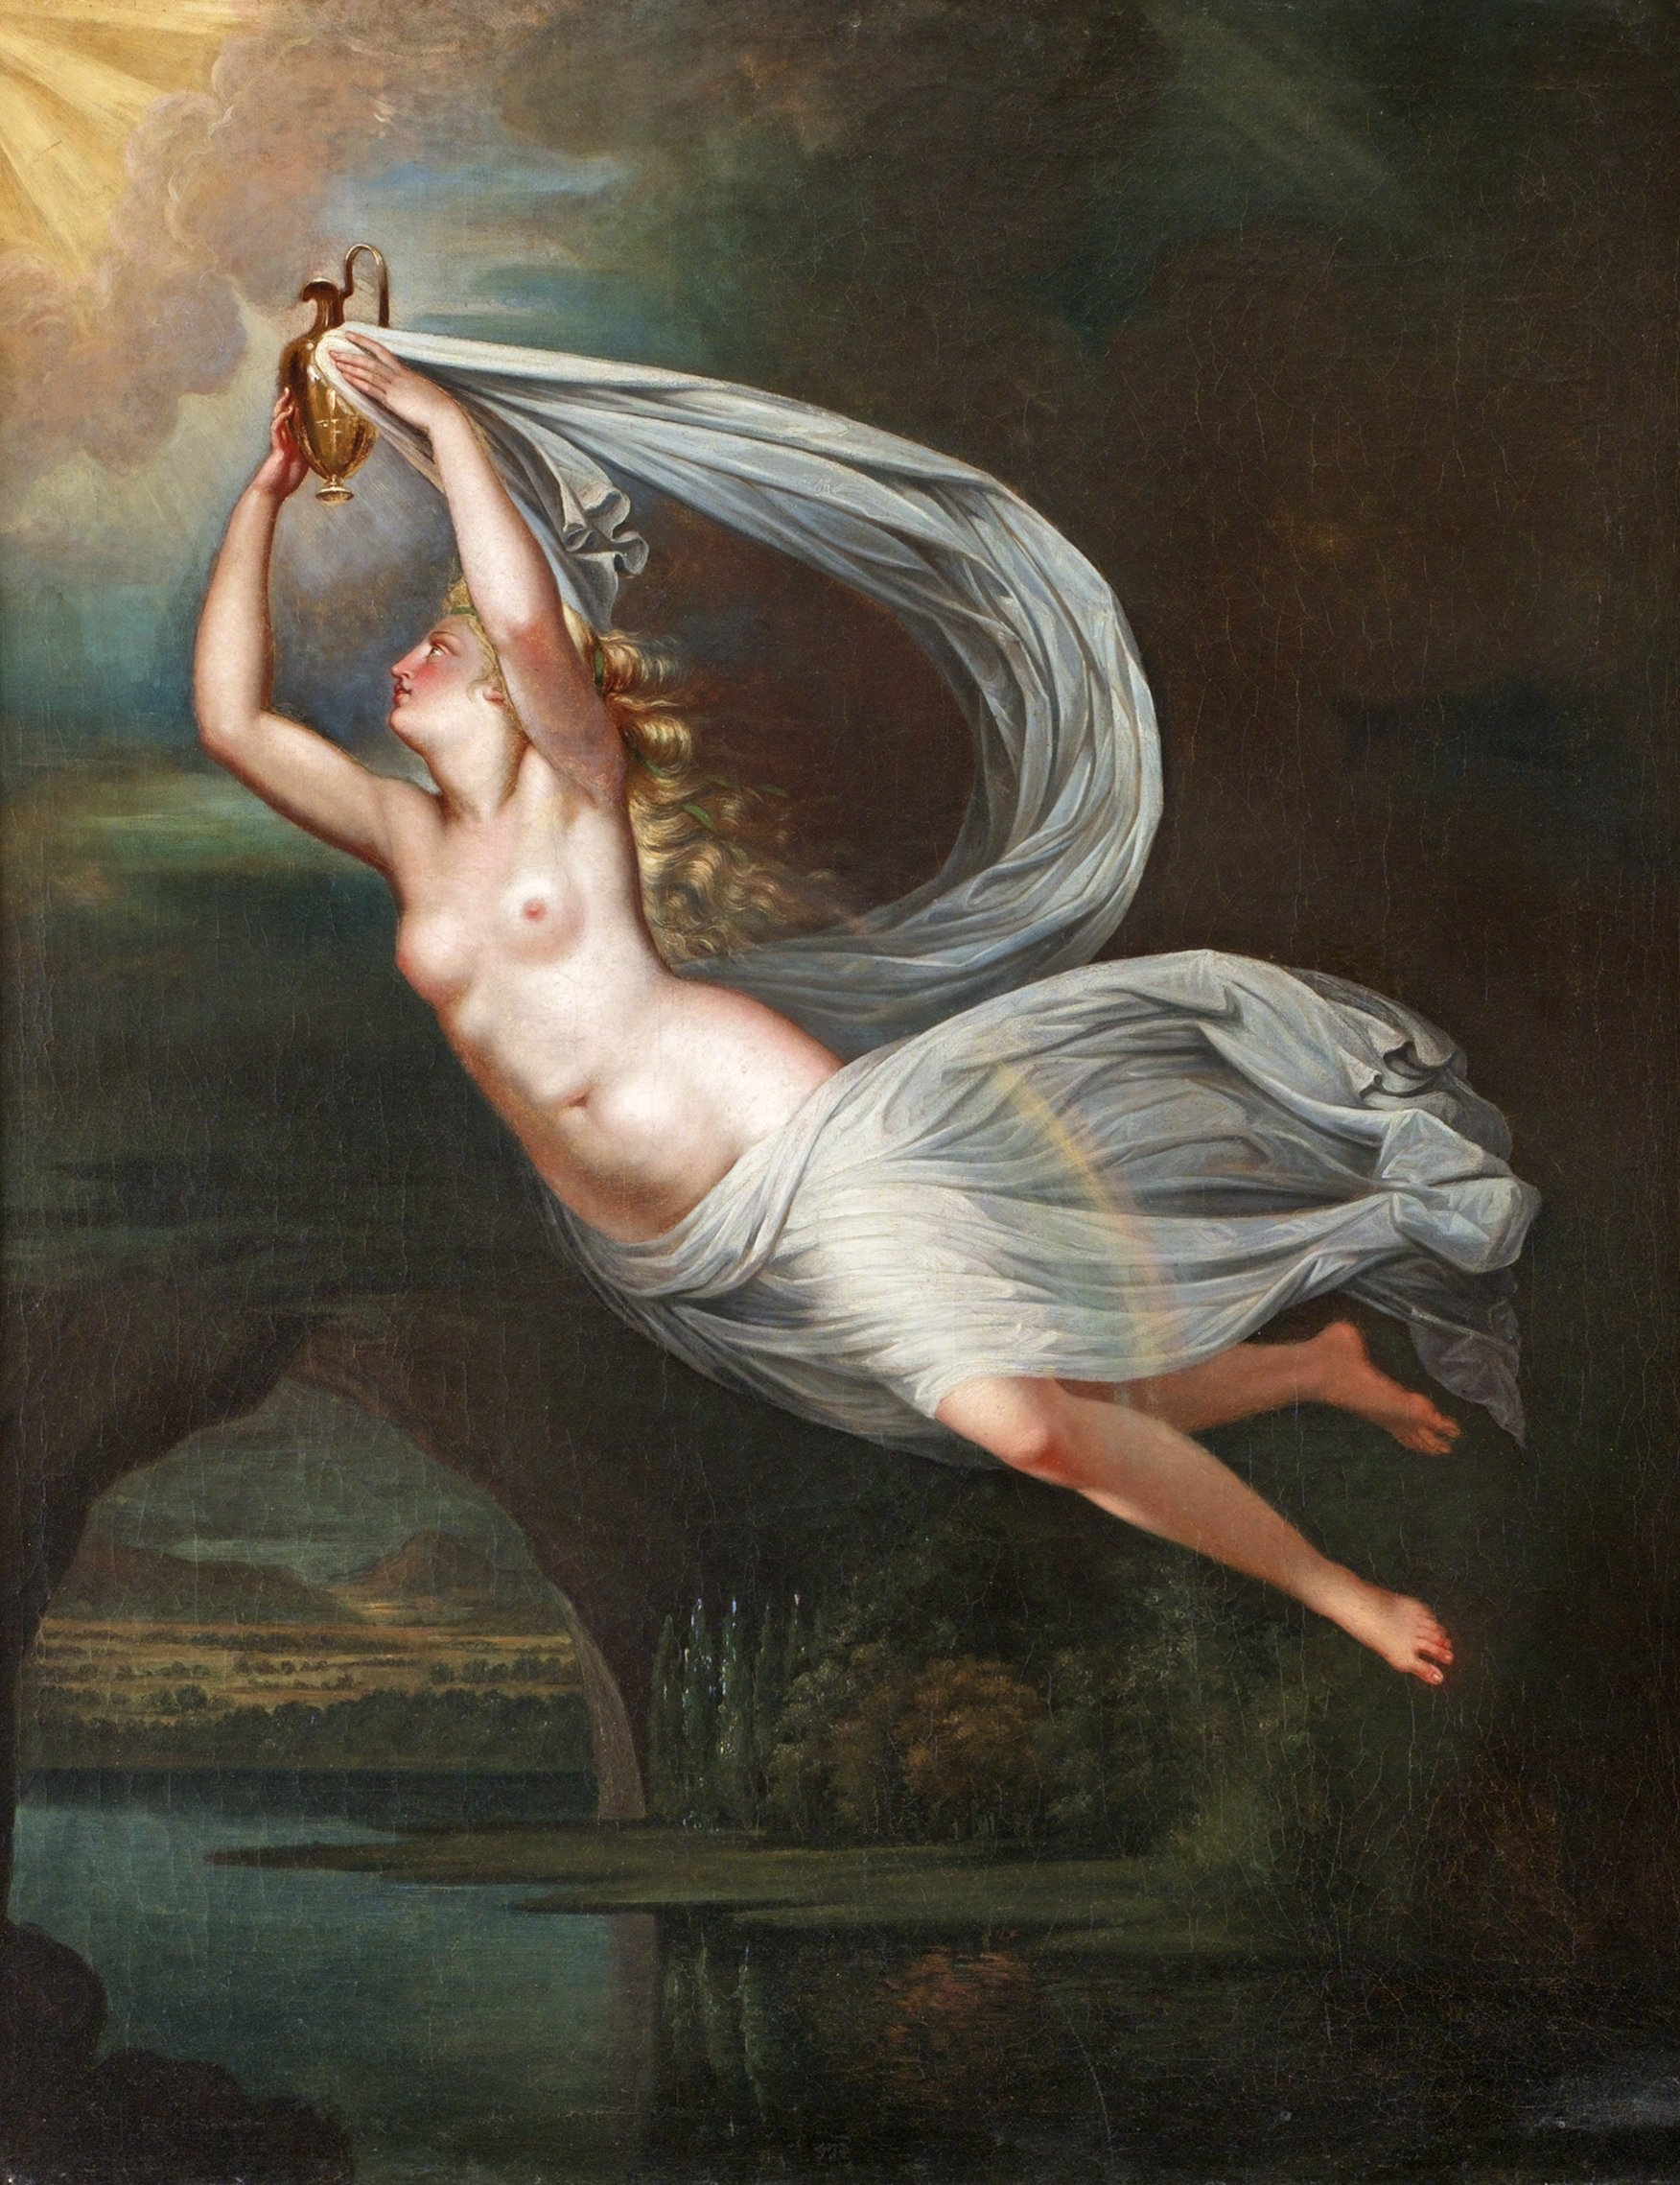 Fredric Westin, 1782-1862. Аврора. 74 х 62 см. Частная коллекция